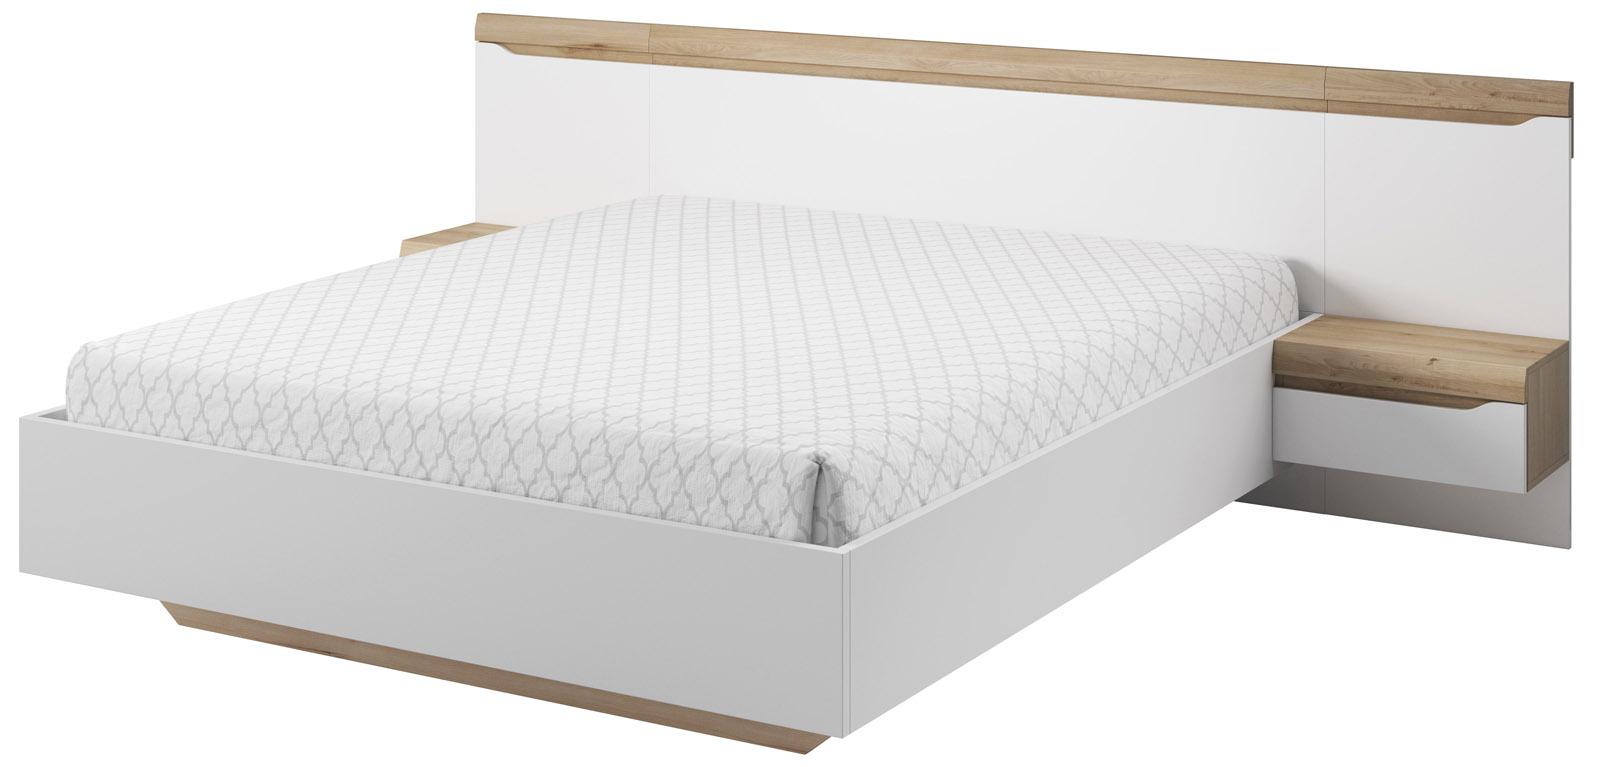 Manželská postel bílá Antonio